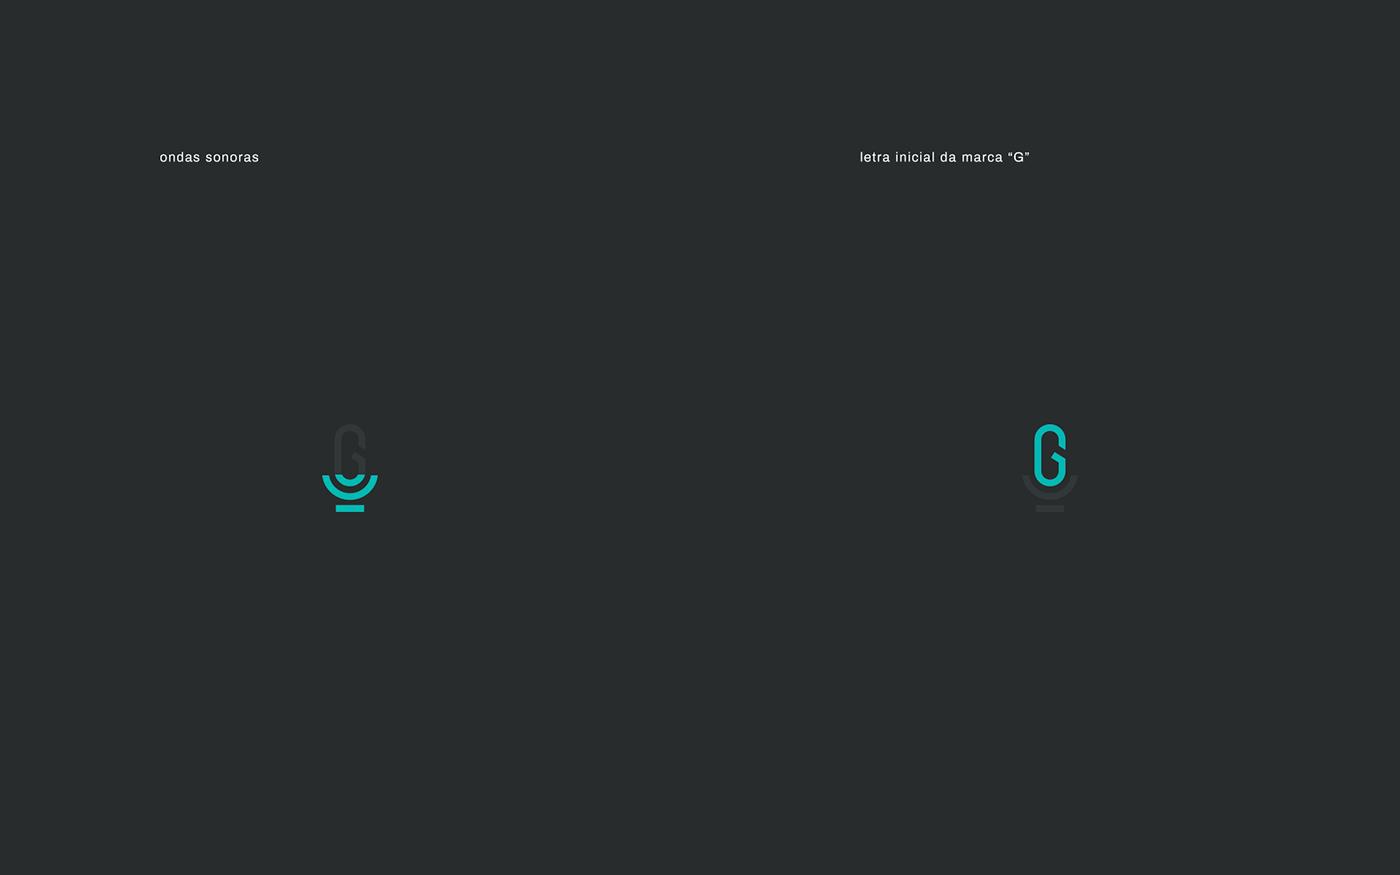 graphic locutor microfone Radio type voice branding  identidade visual logo Logotipo